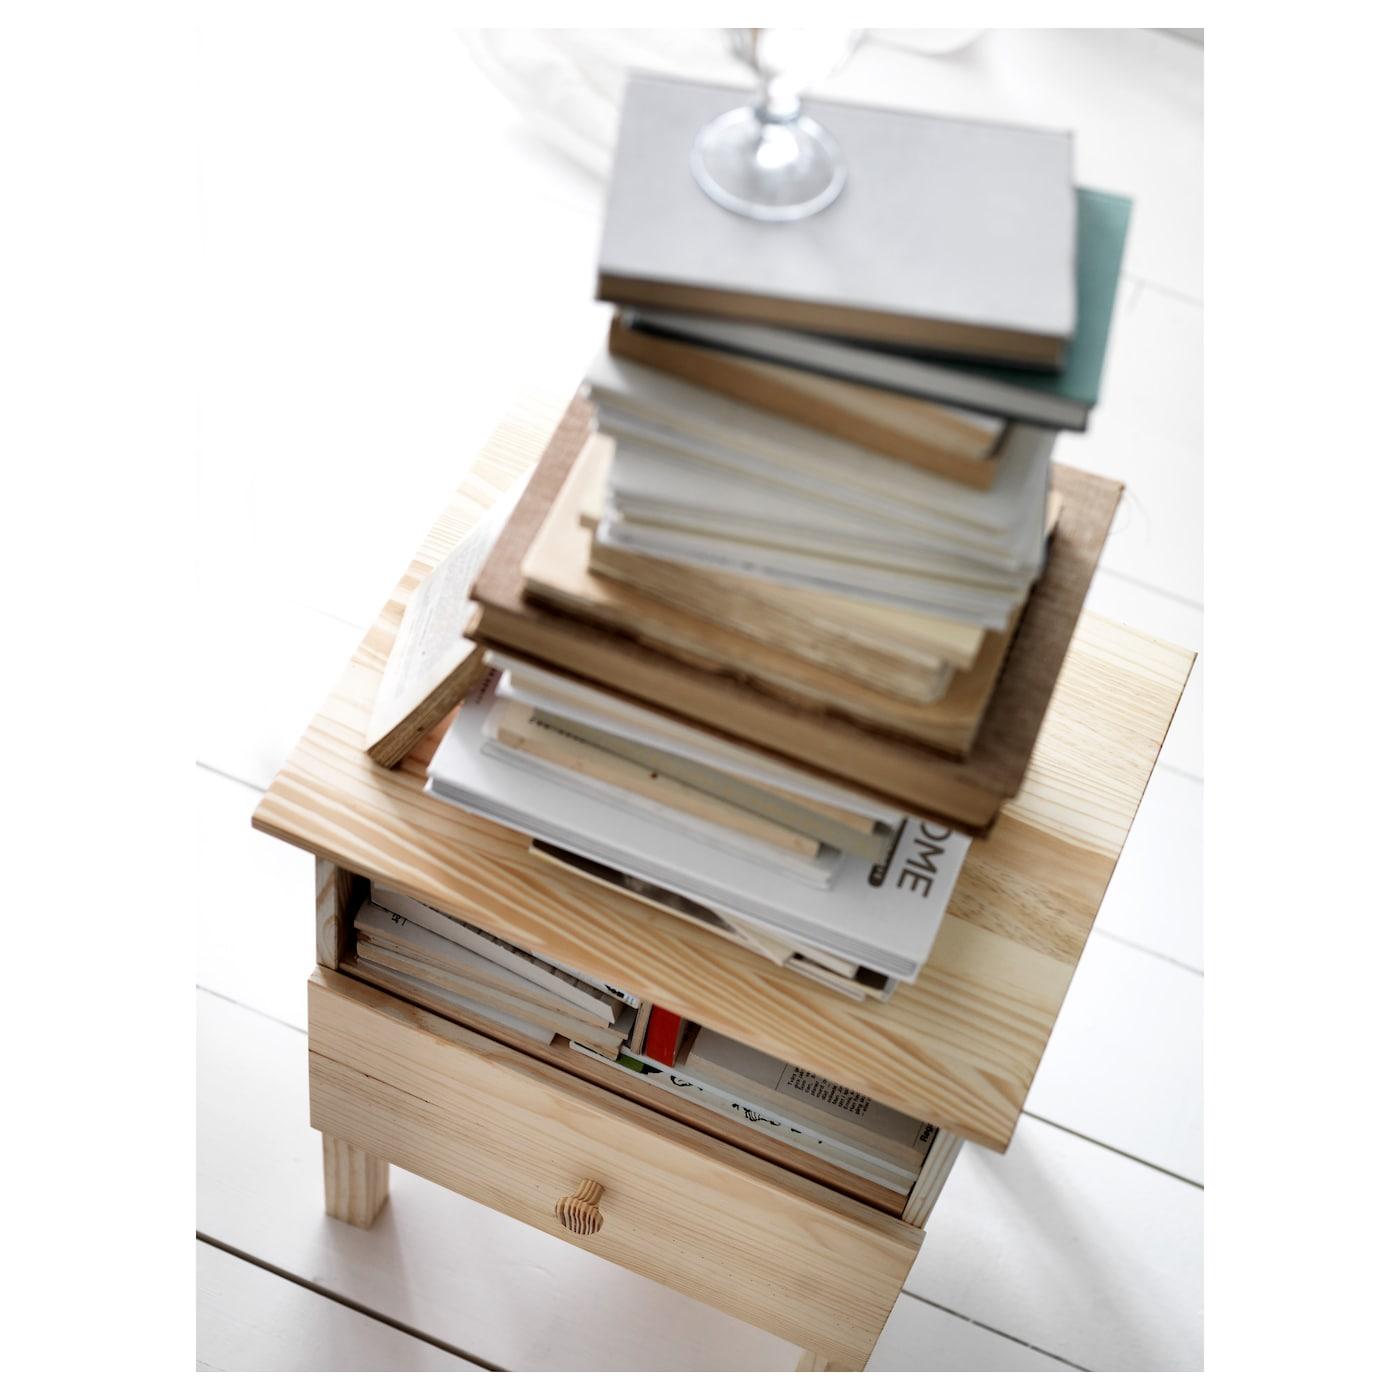 tarva table de chevet pin 48x62 cm ikea. Black Bedroom Furniture Sets. Home Design Ideas